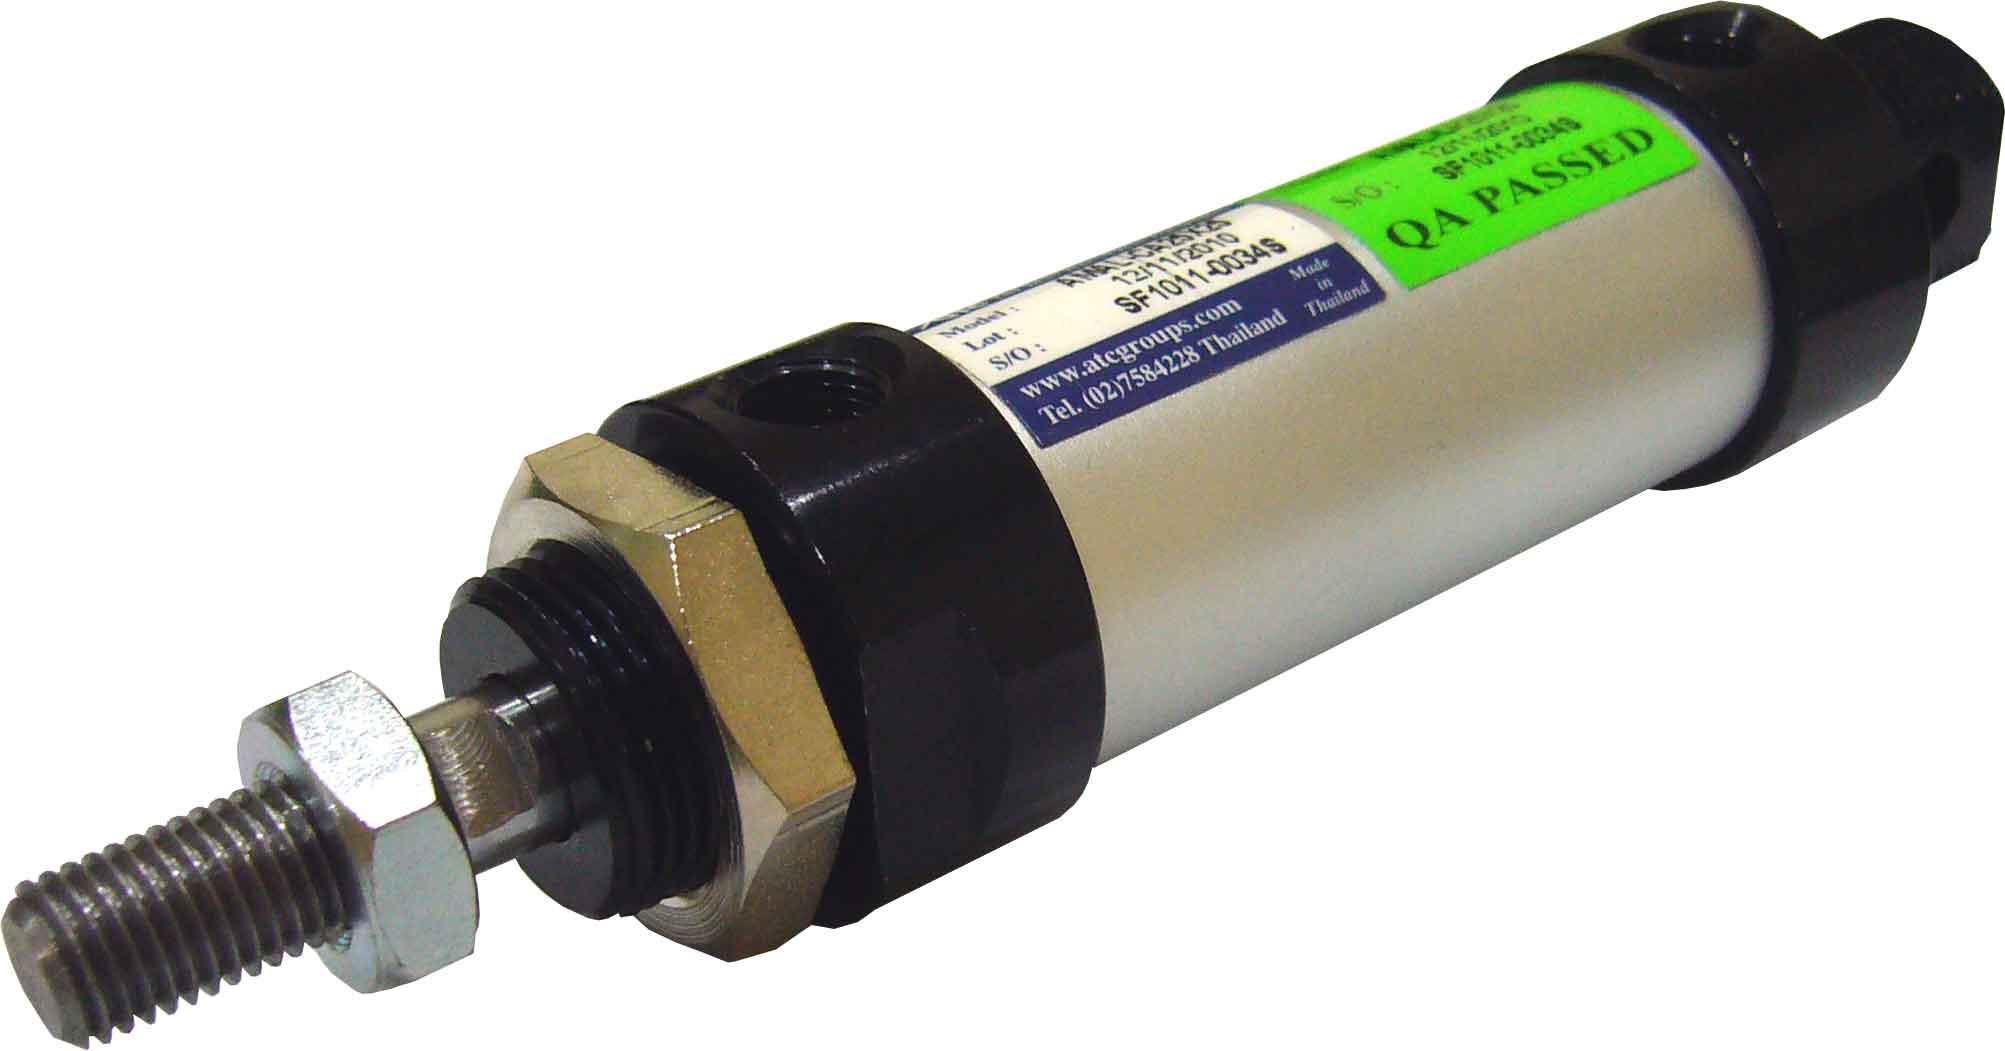 ISO6430 Aluminum Slim Cylinder (MIAL MIALD MIALJ MIALT Series)